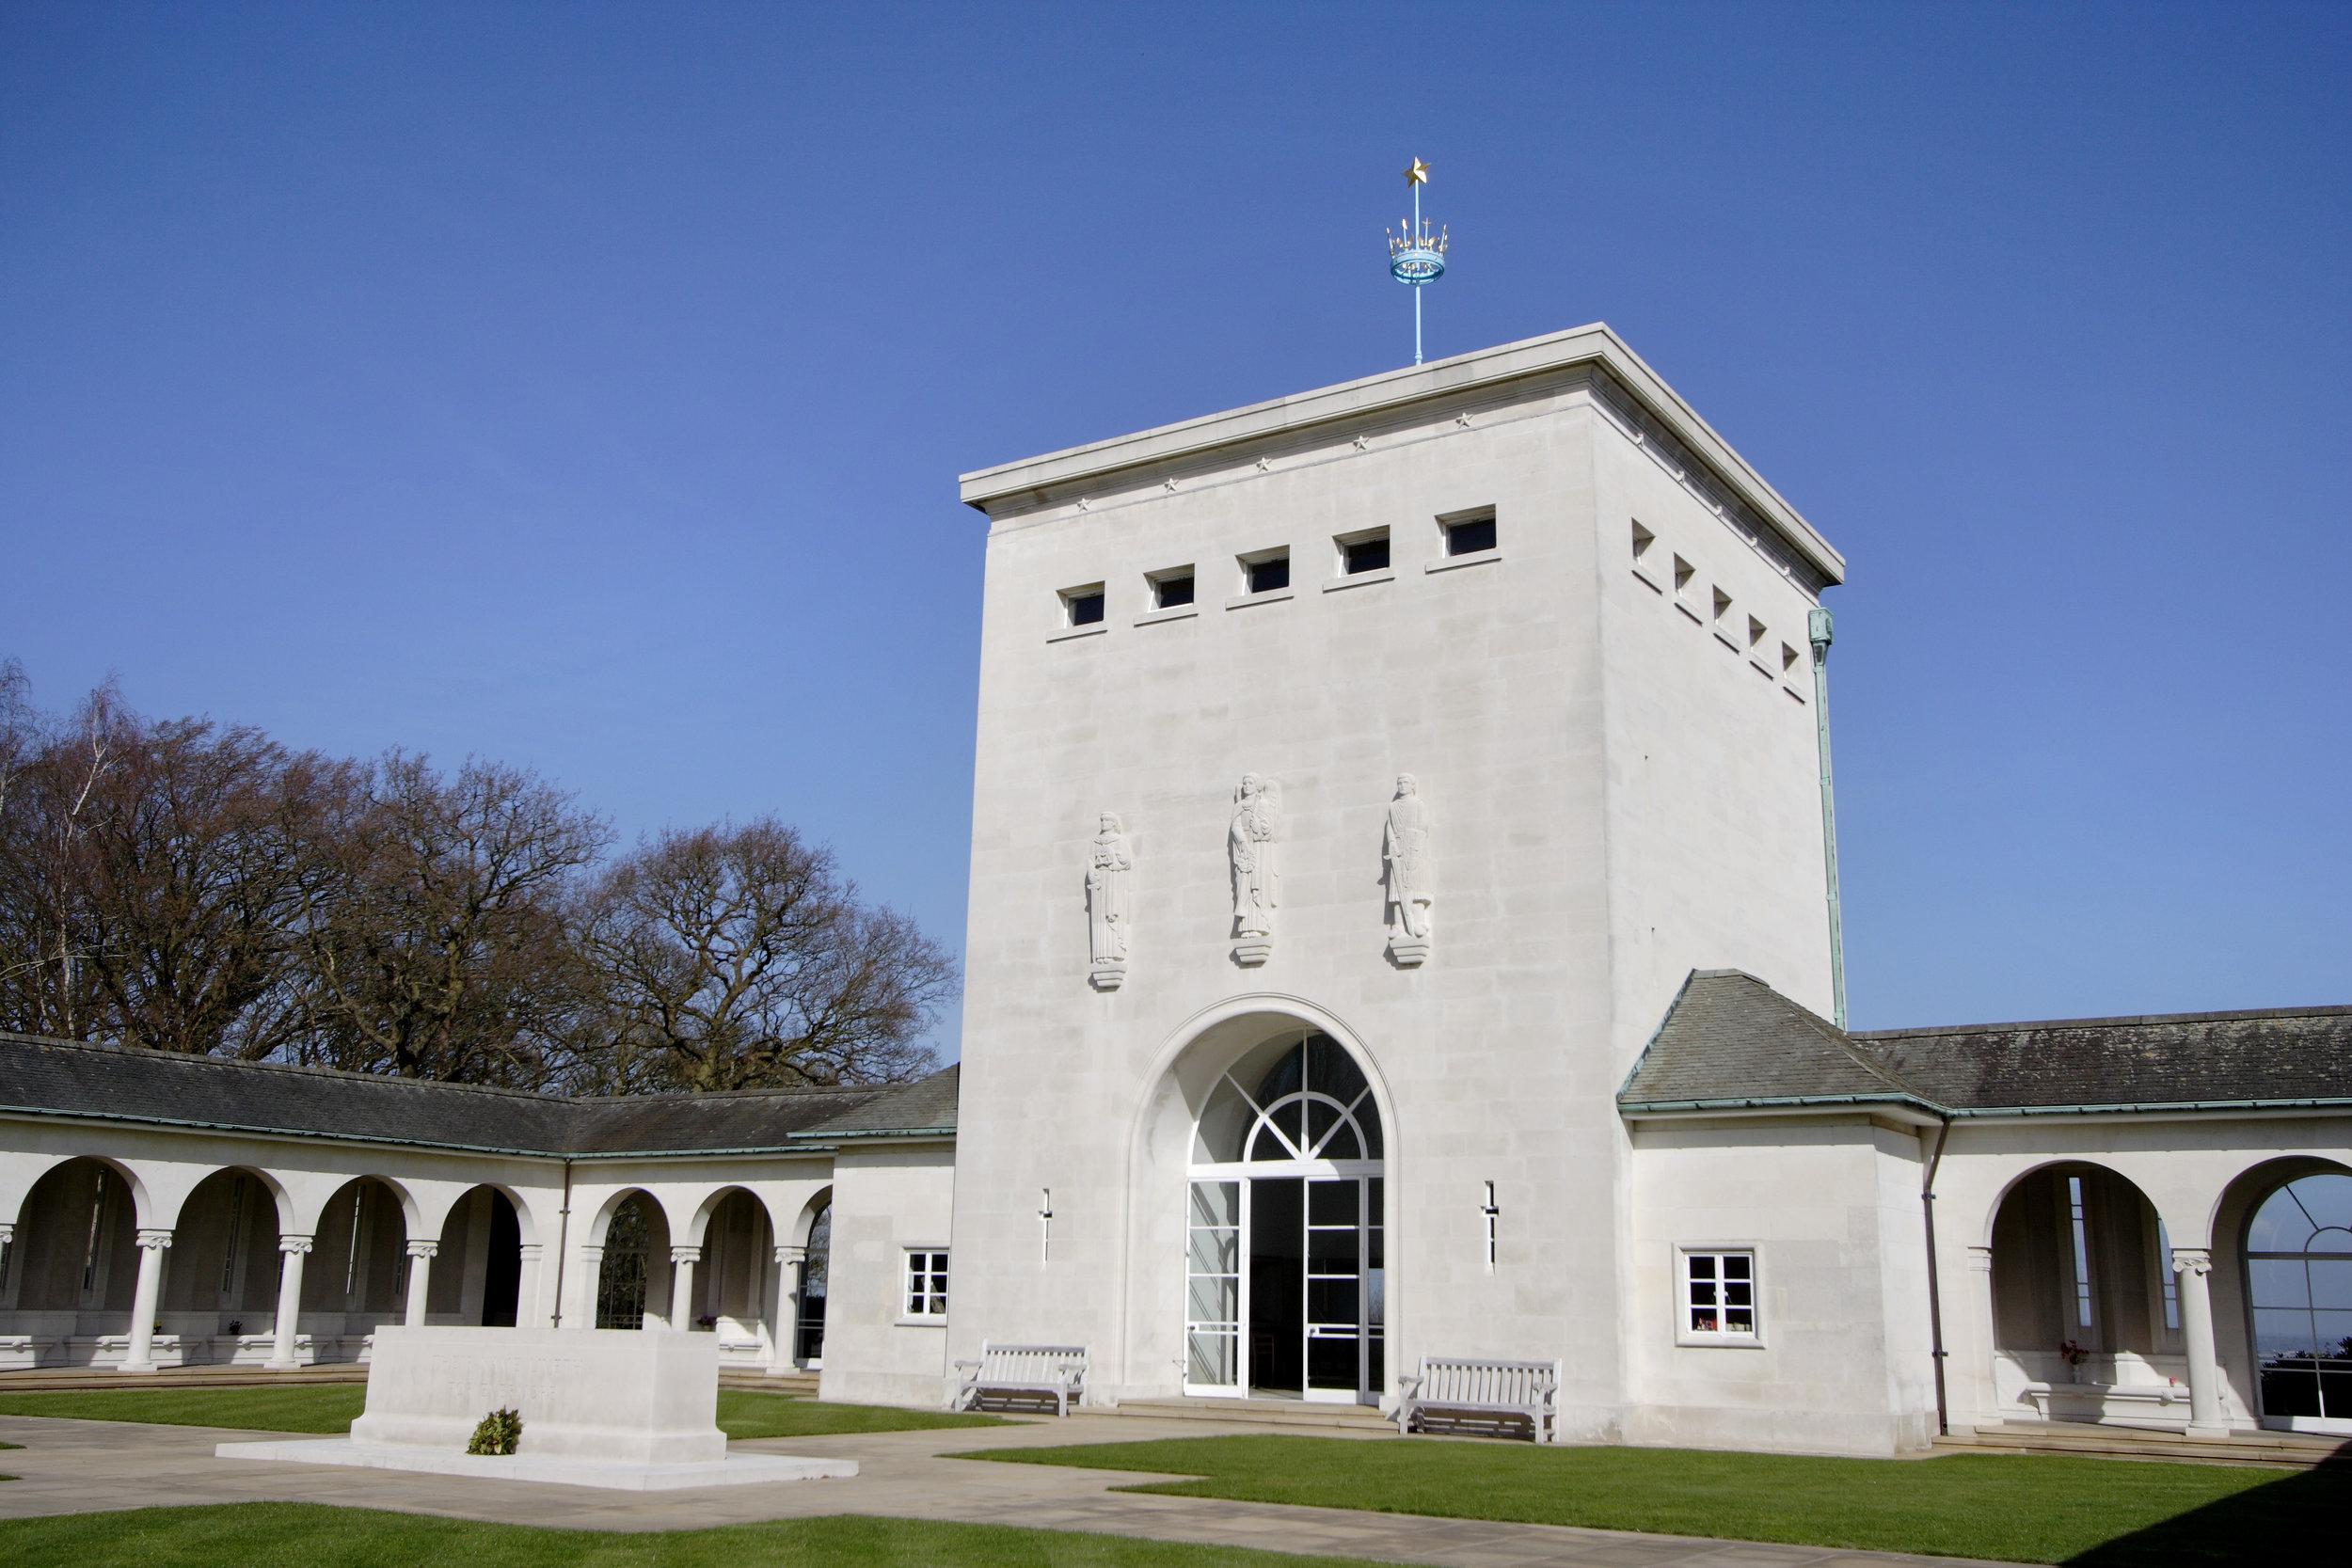 CWGC Runnymede Memorial